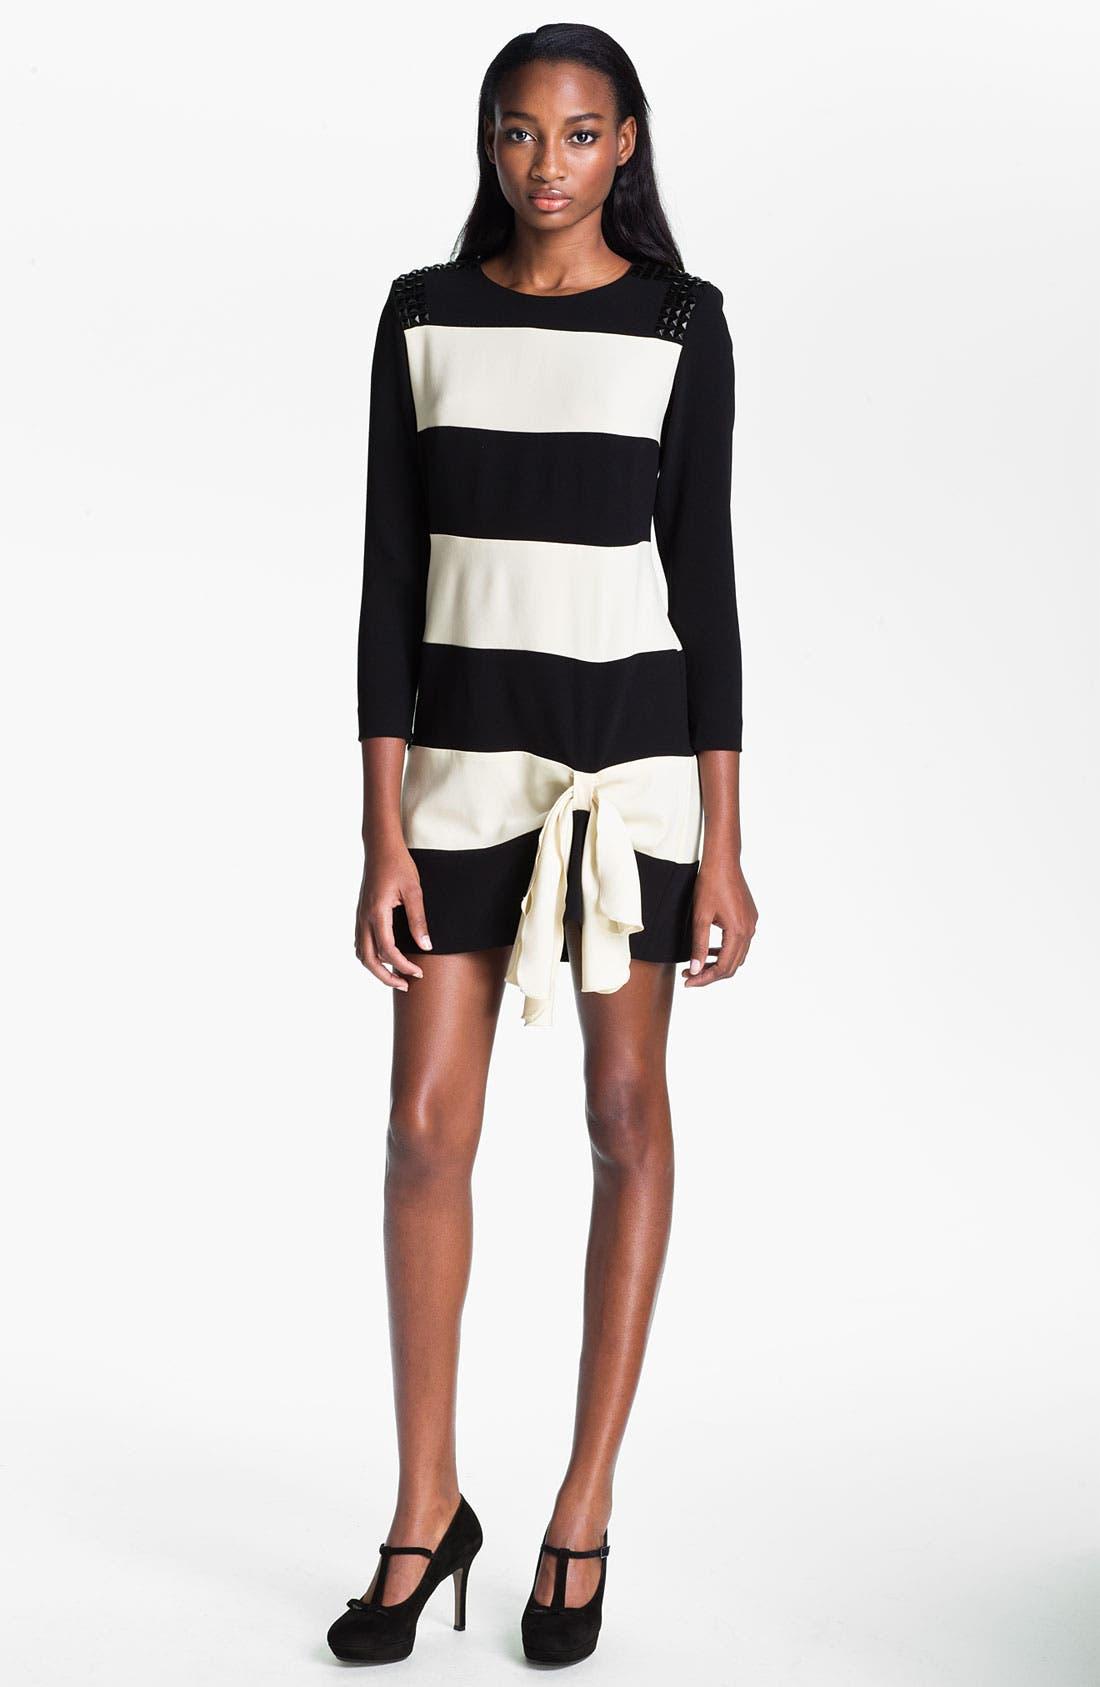 Main Image - Skaist-Taylor 'Rosie' Stud & Stripe Dress